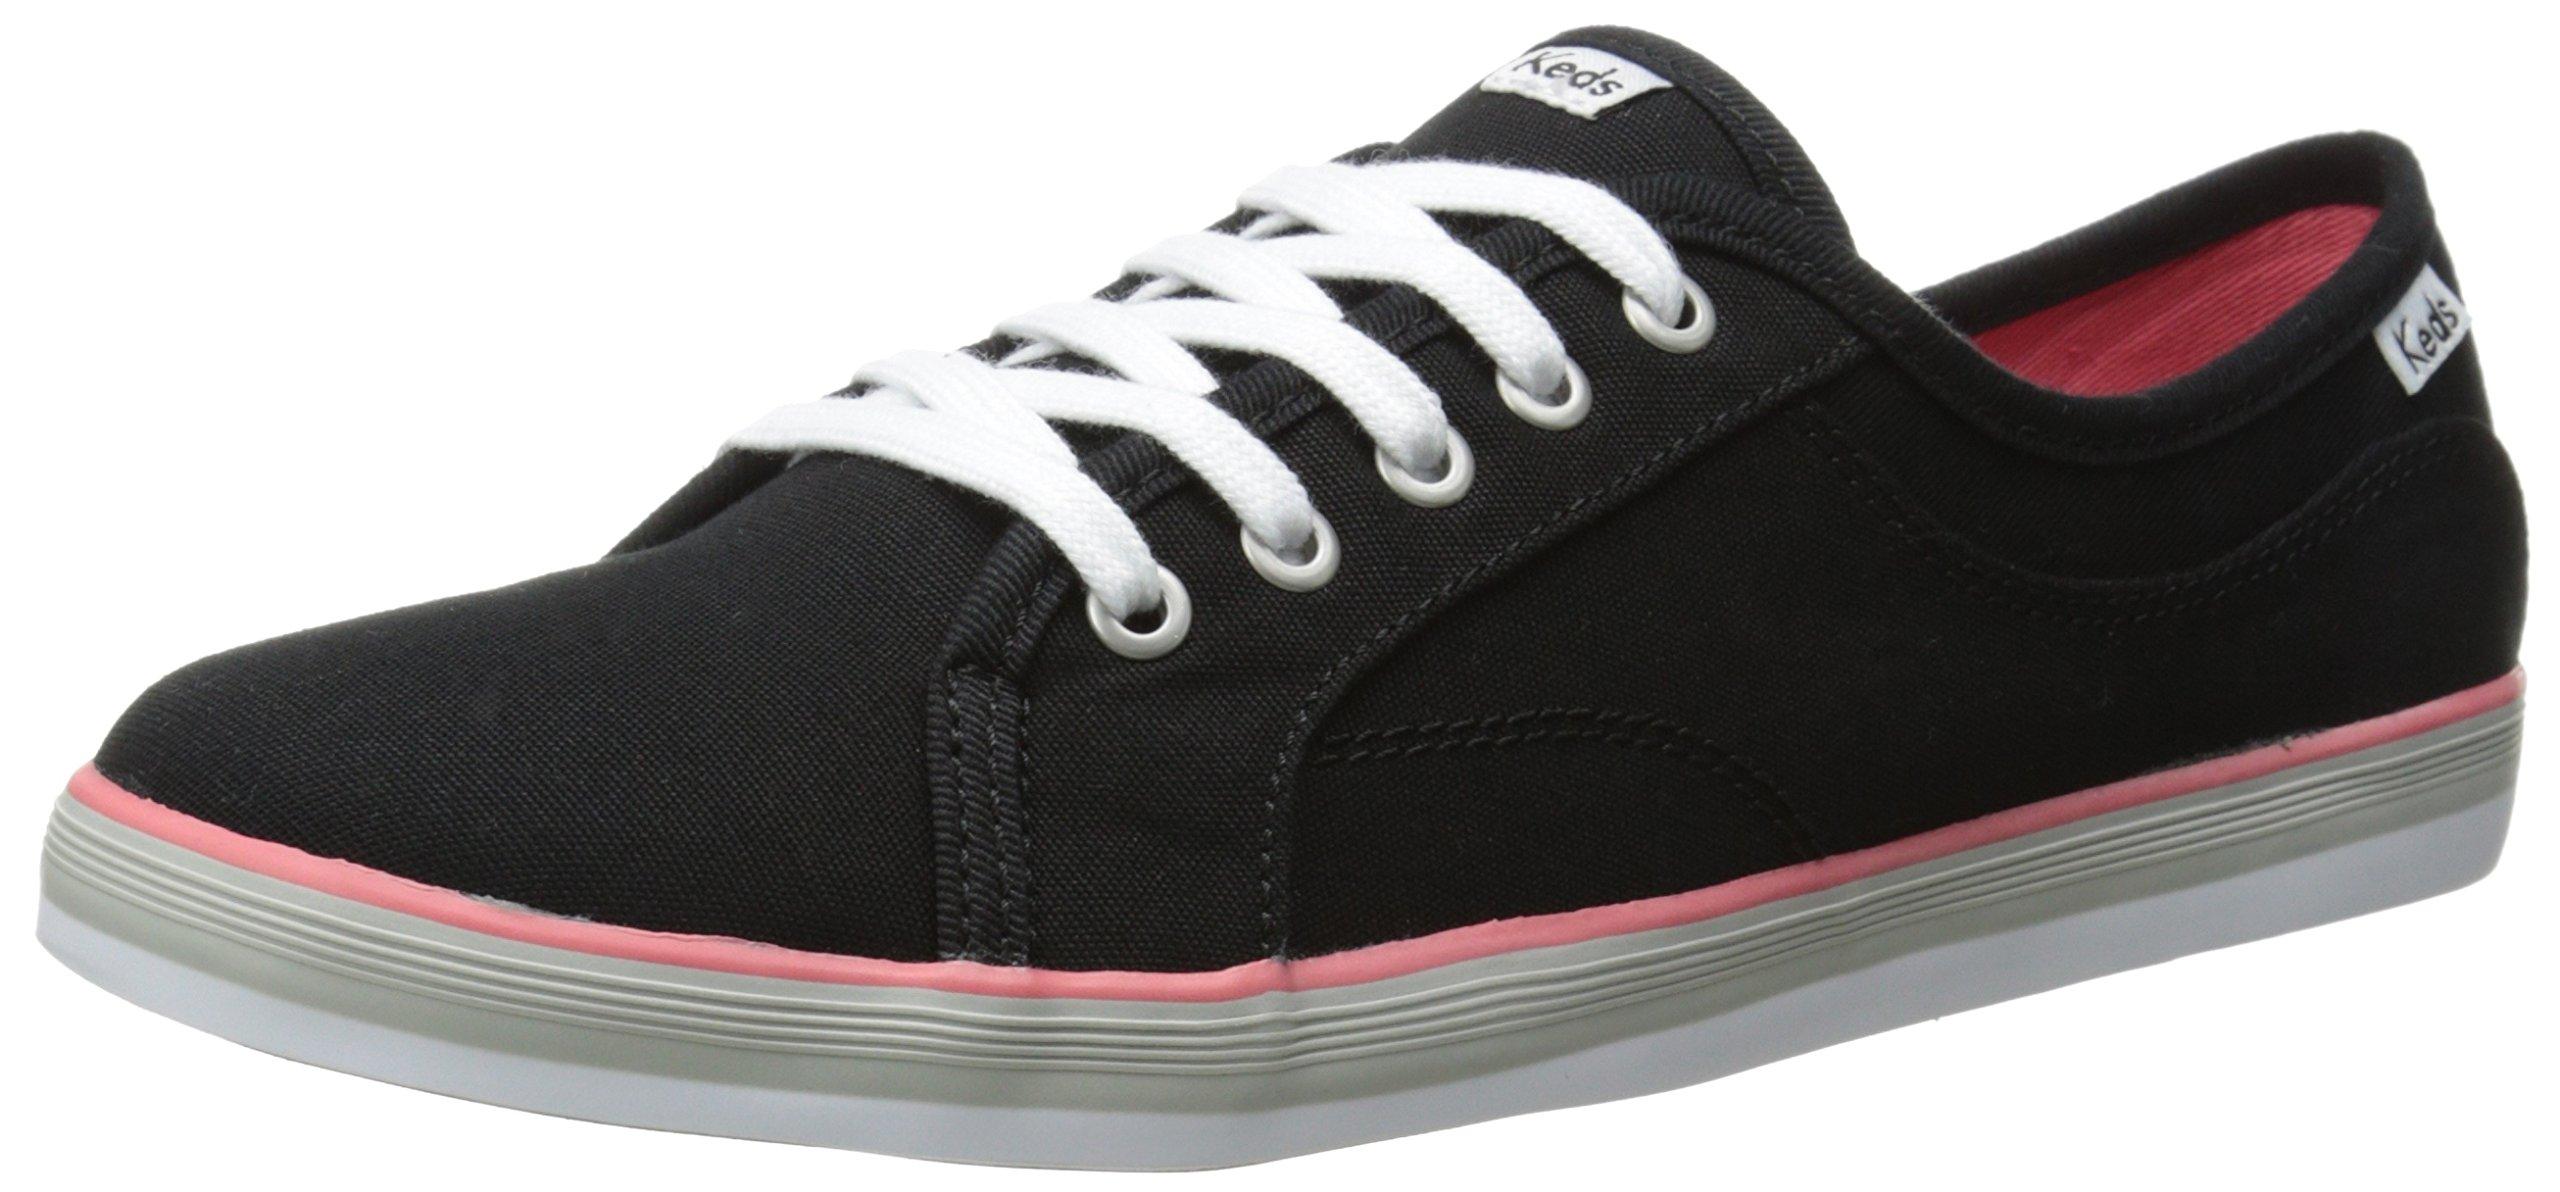 Keds Women's Coursa LTT Fashion Sneaker